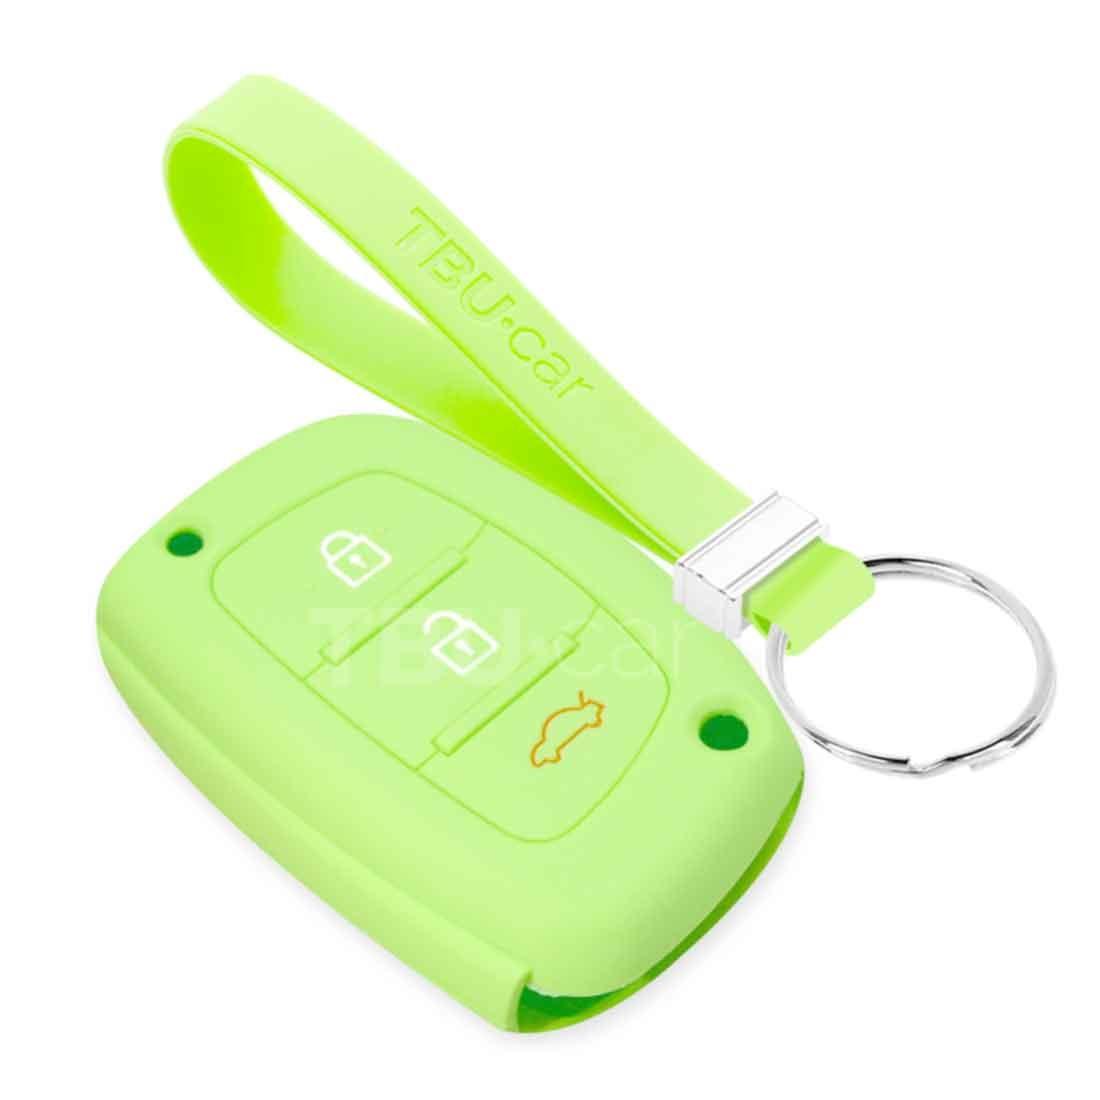 TBU car TBU car Sleutel cover compatibel met Hyundai - Silicone sleutelhoesje - beschermhoesje autosleutel - Glow in the Dark